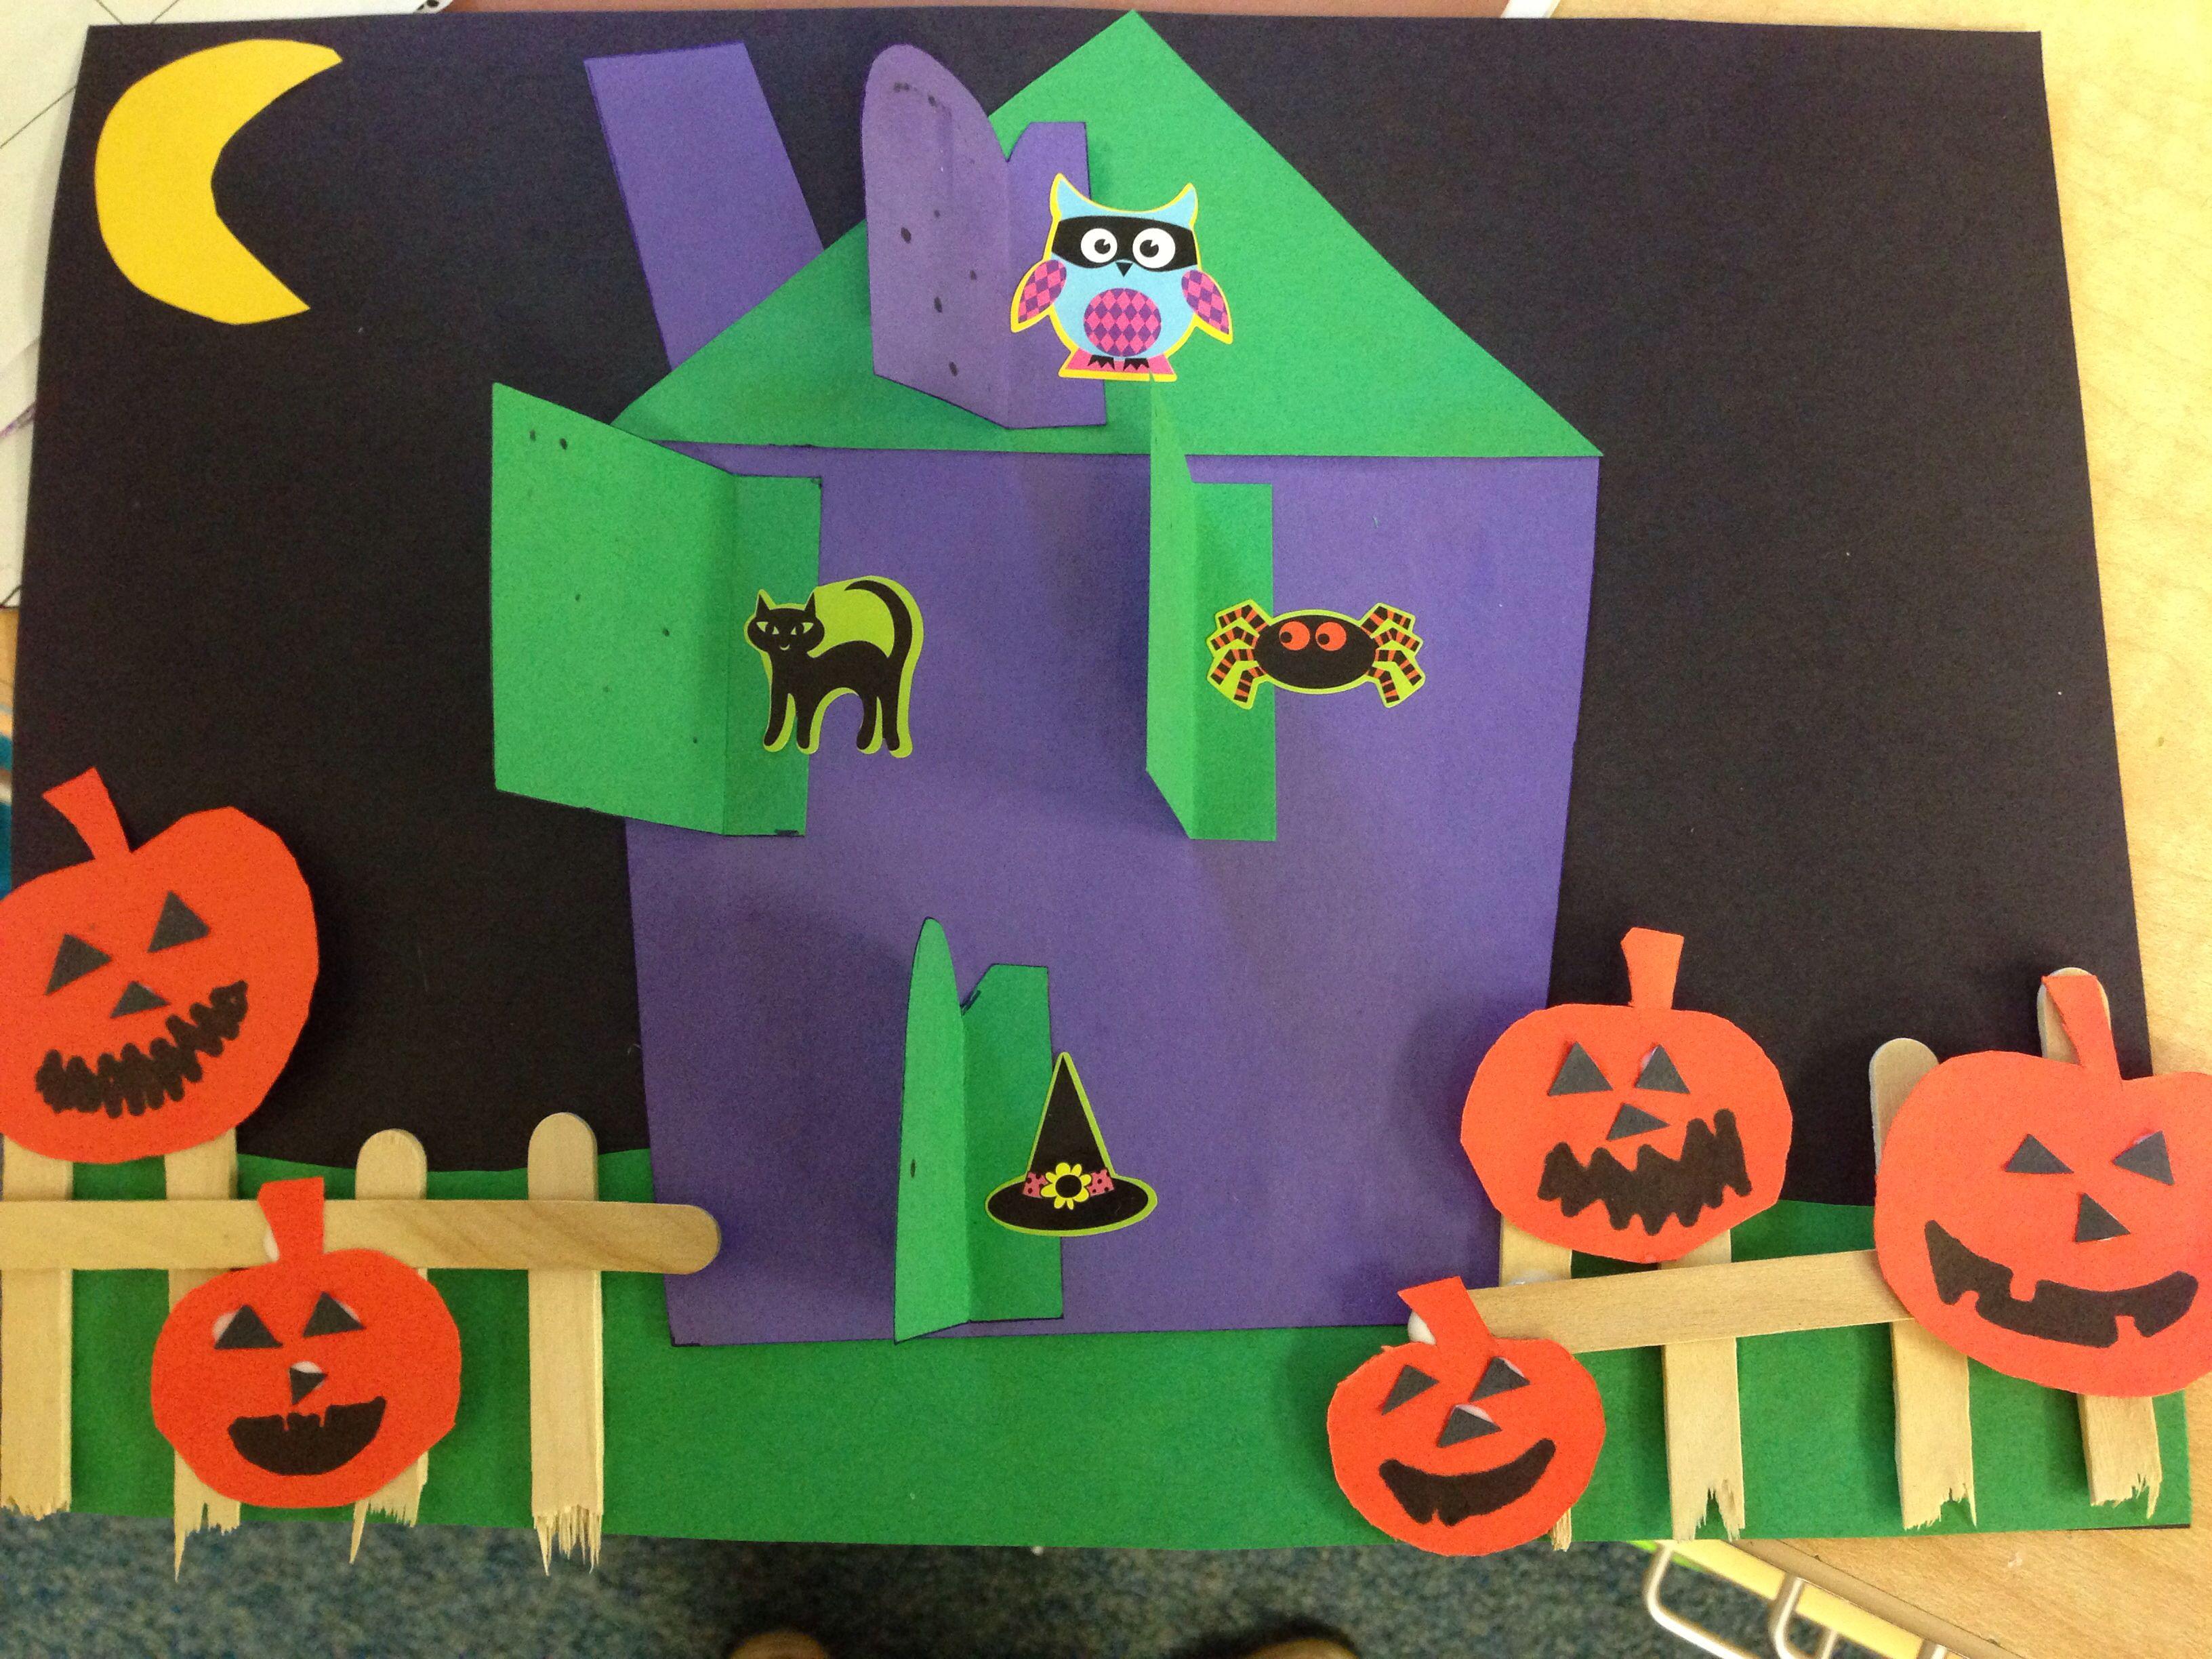 5 Little Pumpkins Preschool Or Kindergarten Craft That